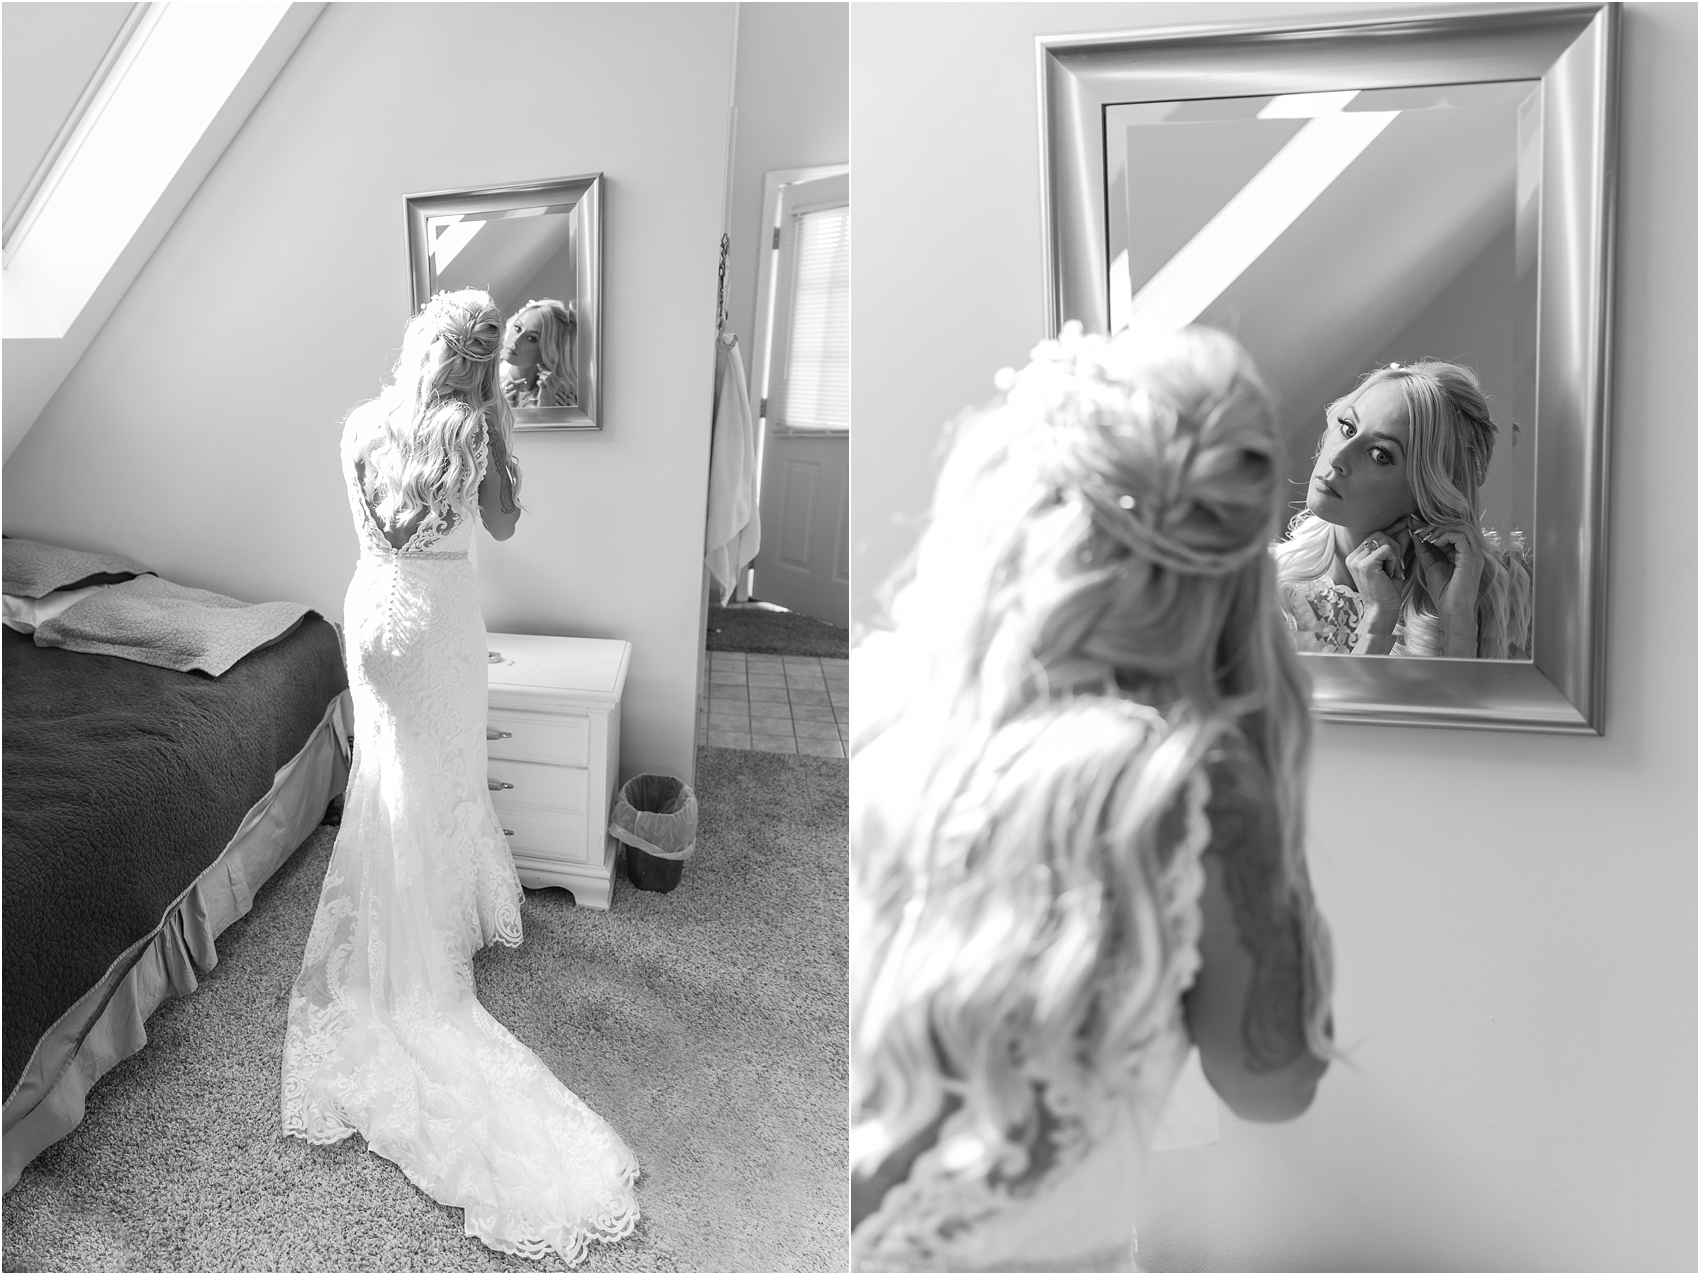 fun-whimsical-beach-wedding-photos-in-st-joseph-michigan-by-courtney-carolyn-photography_0013.jpg